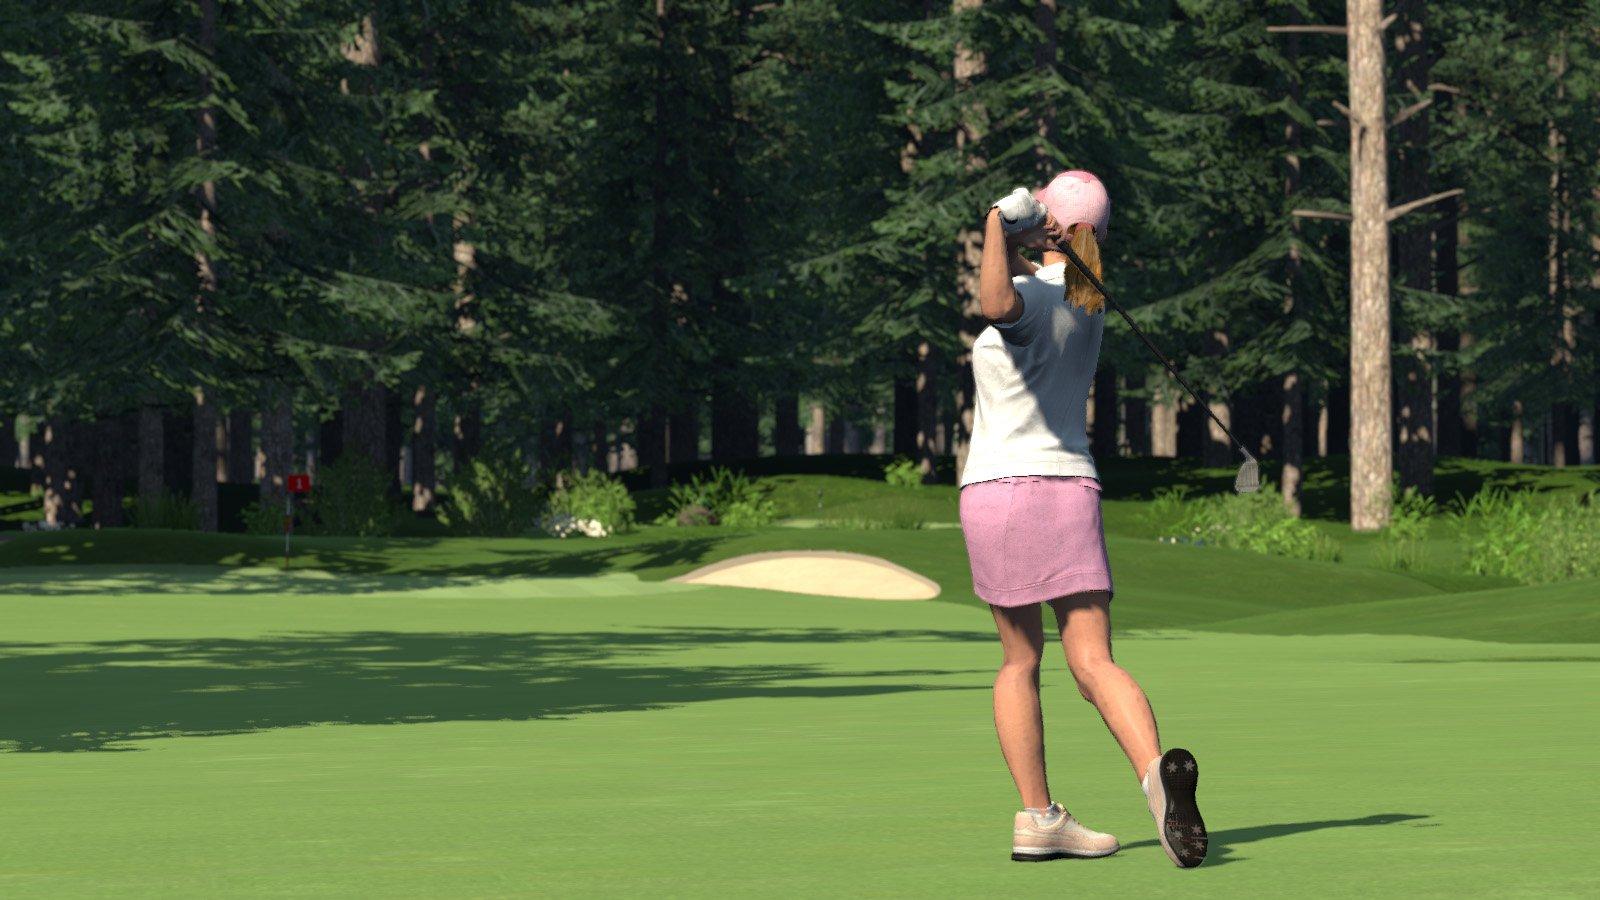 the_golf_club-2449828.jpg